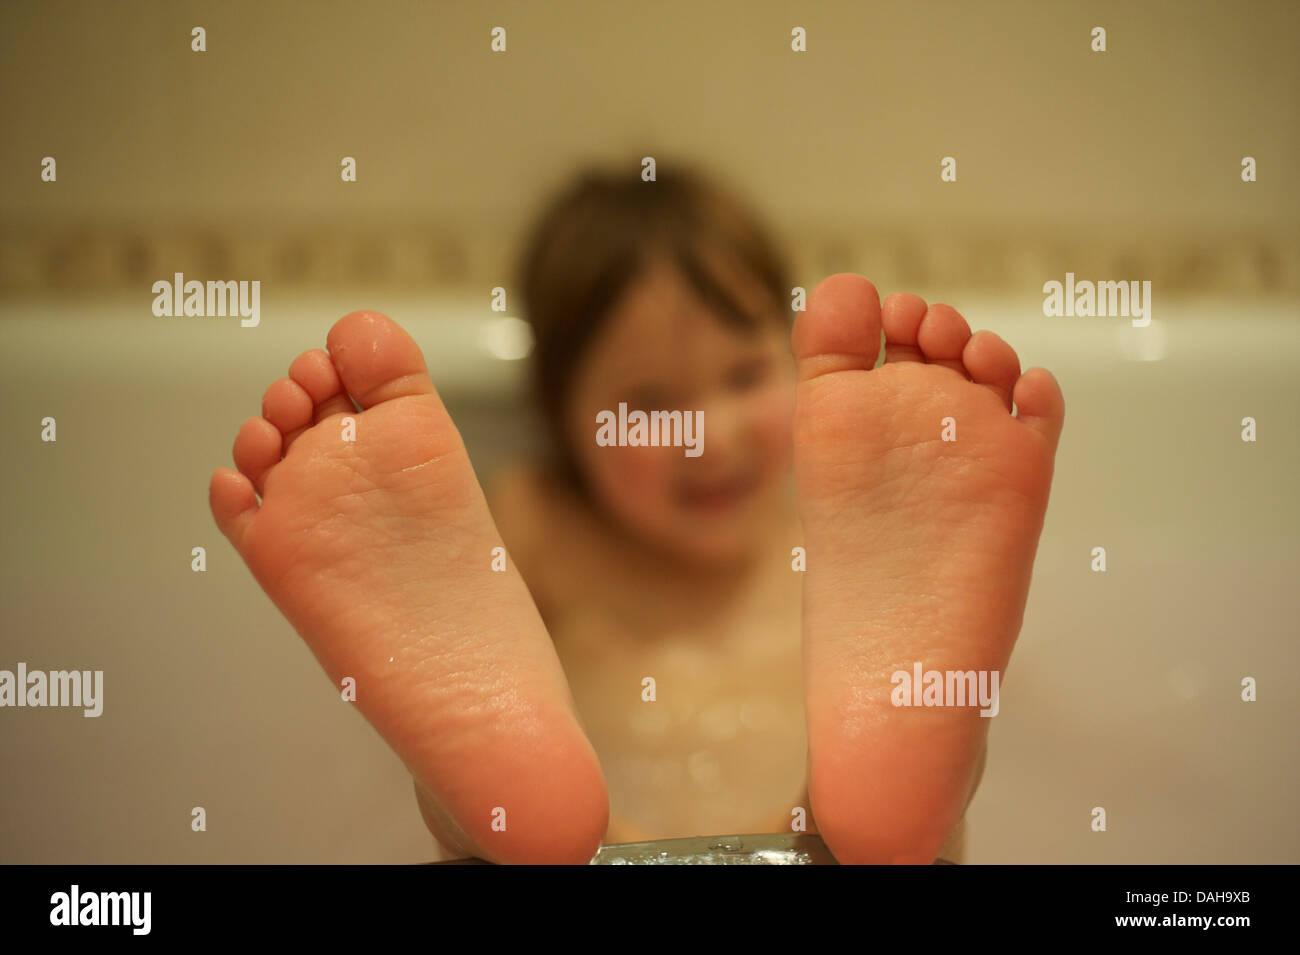 Kinderfuß ragte aus dem Bad. MODEL RELEASED Stockbild